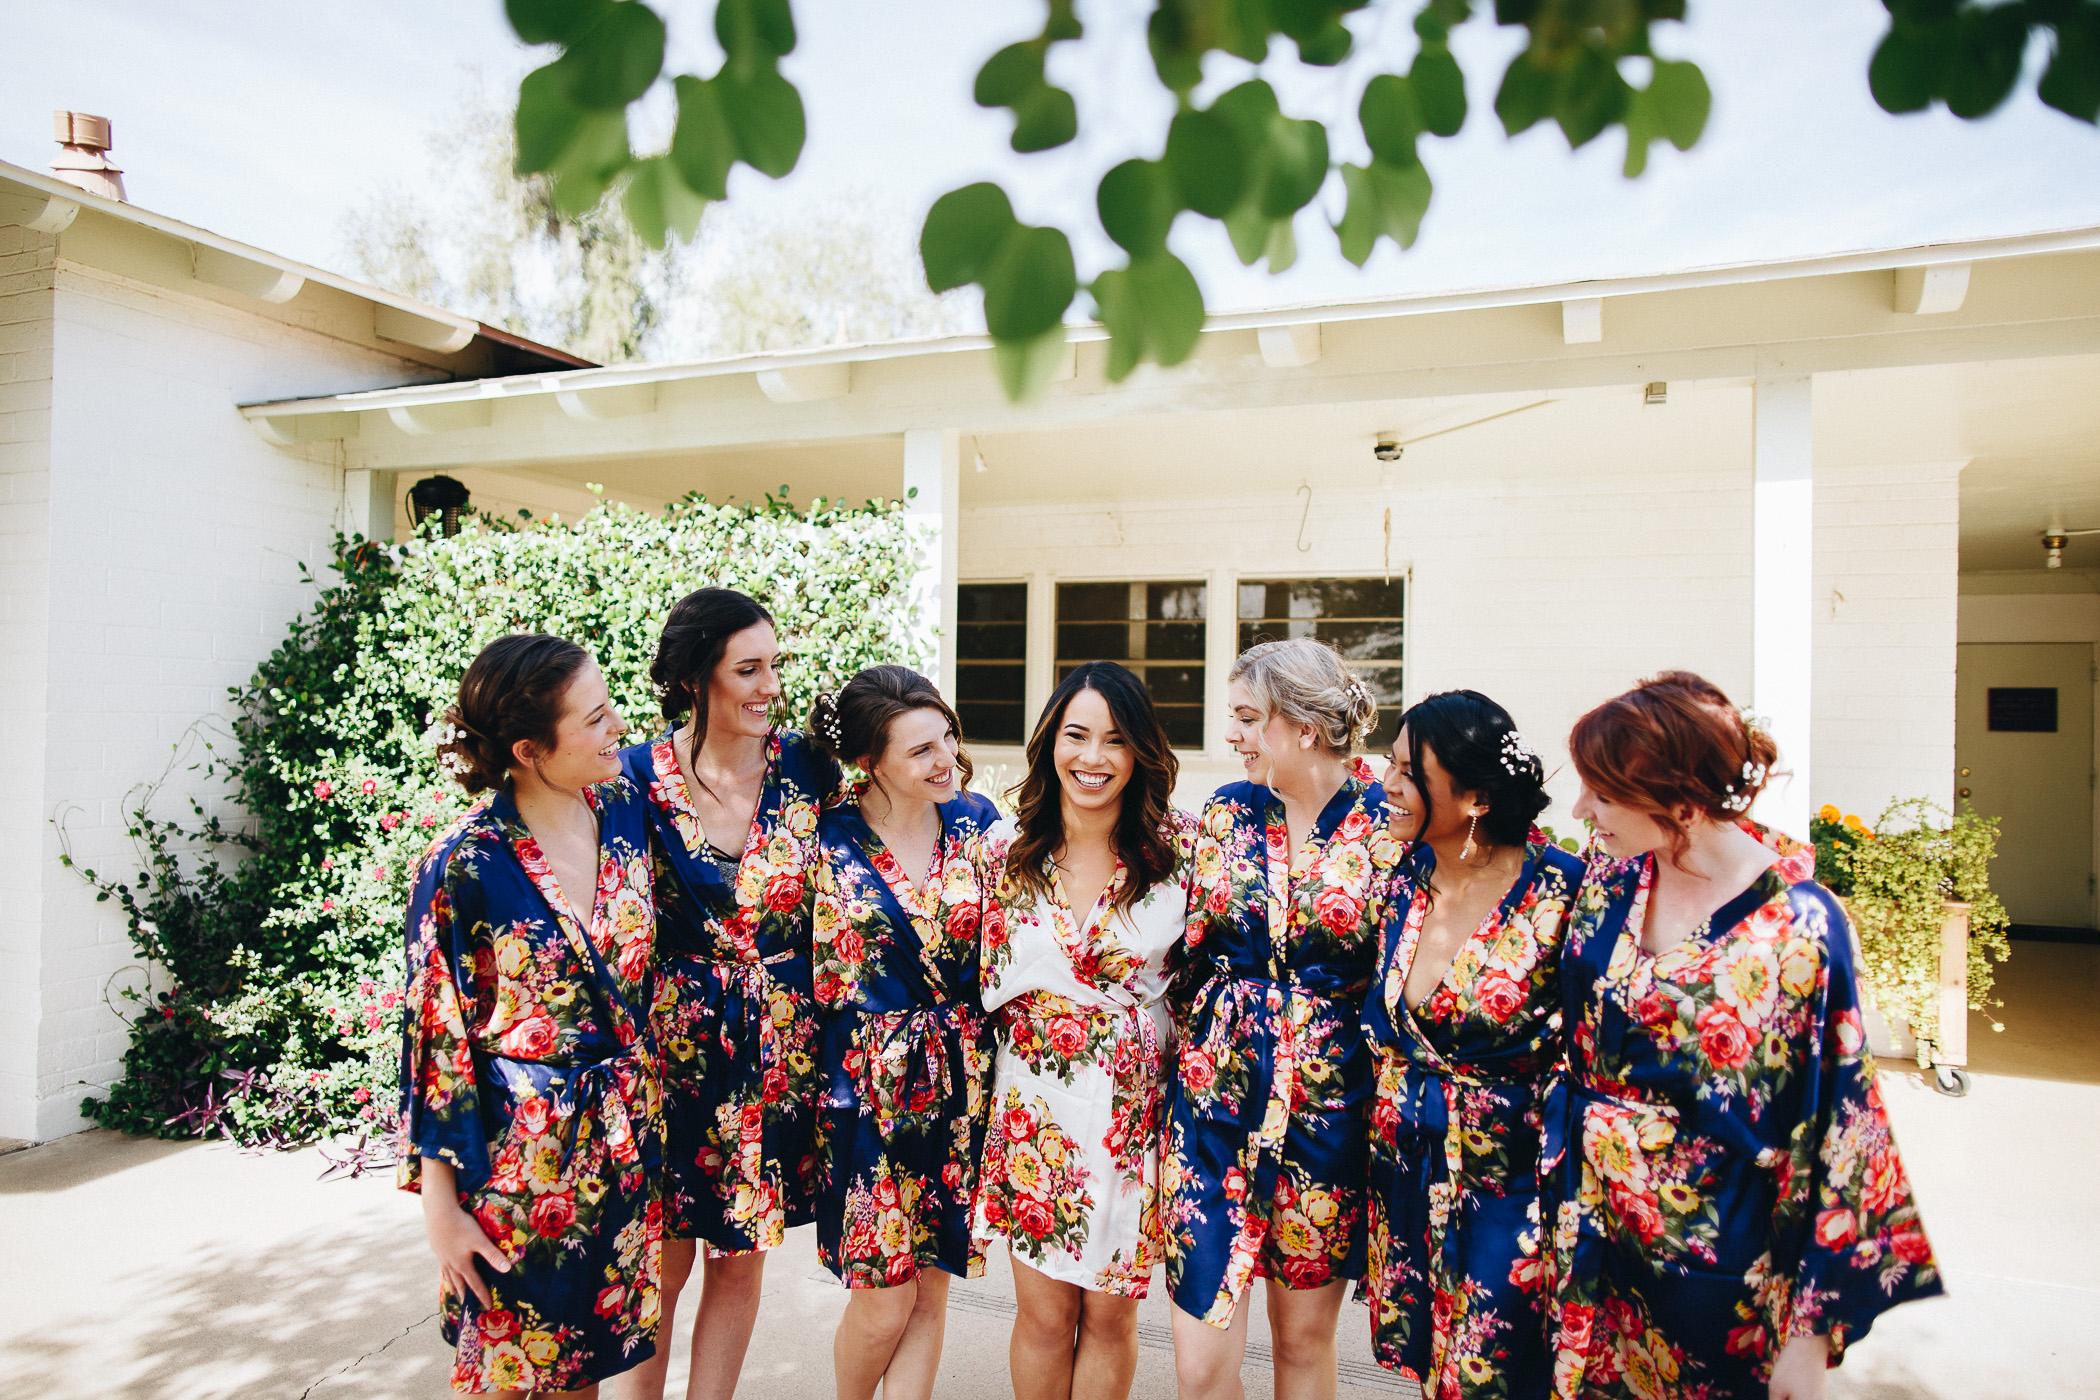 181104-Luxium-Weddings-Arizona-@matt__Le-Brandon-Kariana-Phoenix-Valley-Garden-Center-1005.jpg